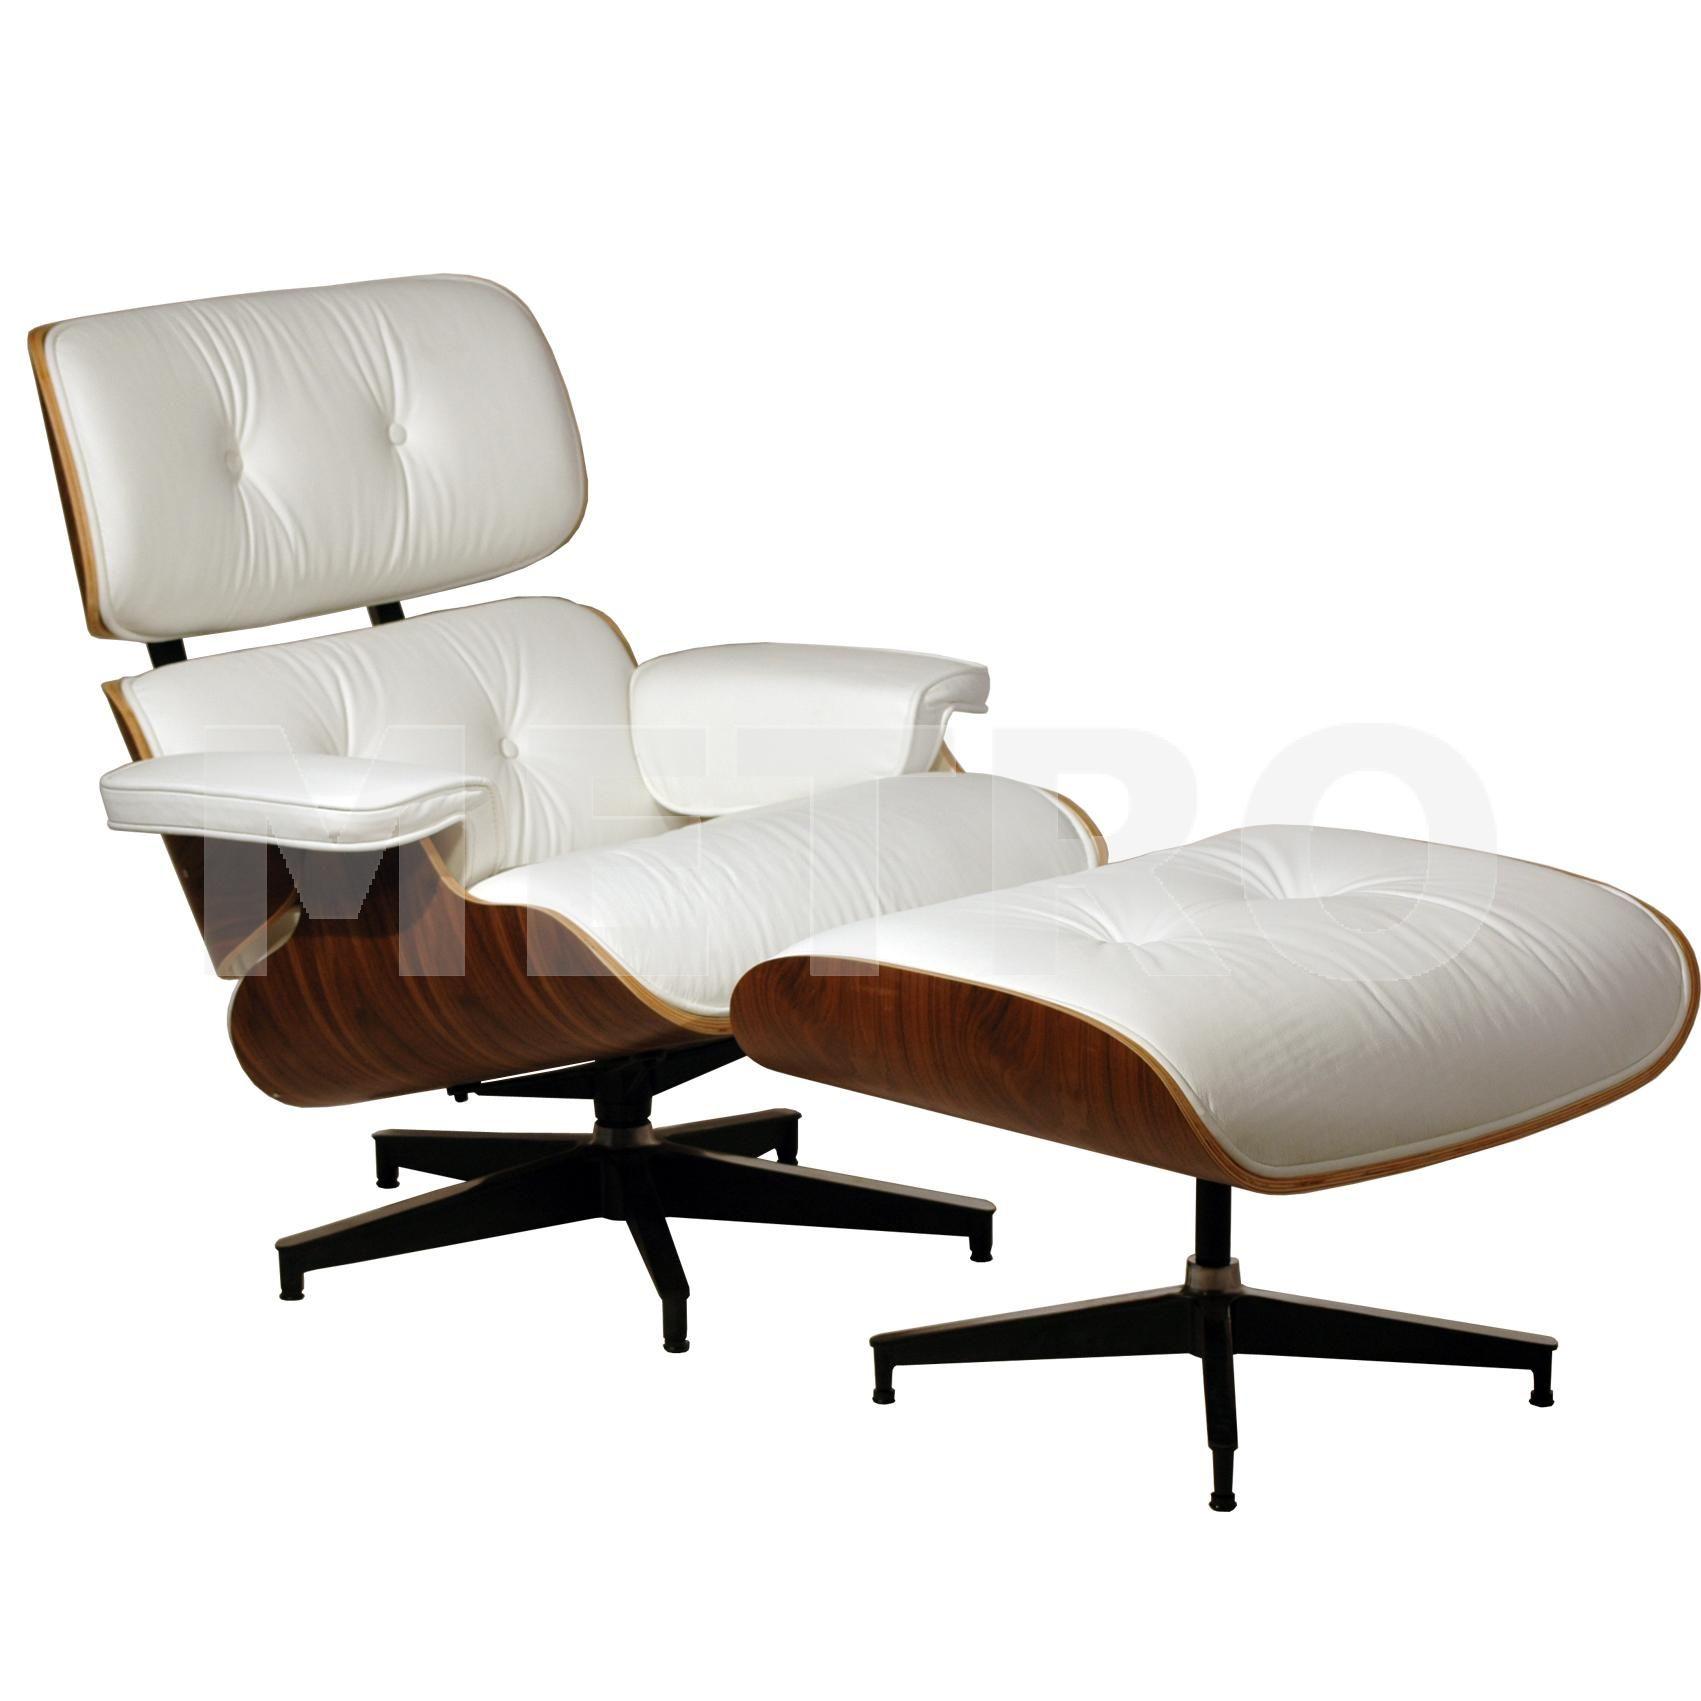 Stupendous Eames Lounge Chair Ottoman In White Leather White Eames Bralicious Painted Fabric Chair Ideas Braliciousco